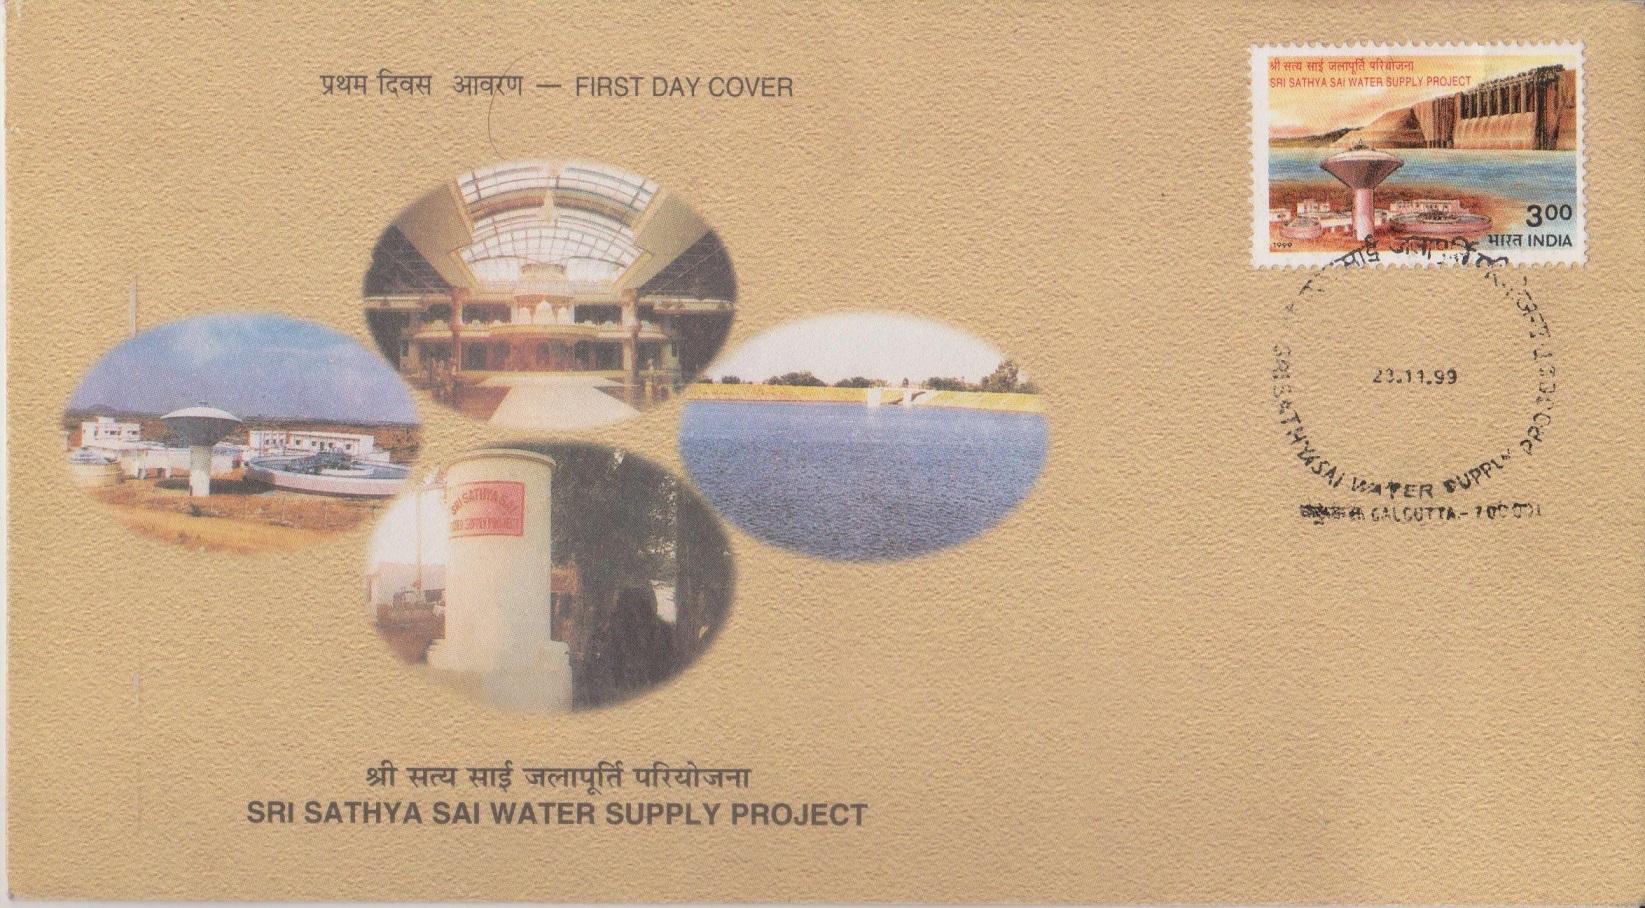 Works of Sri Sathya Sai Central Trust